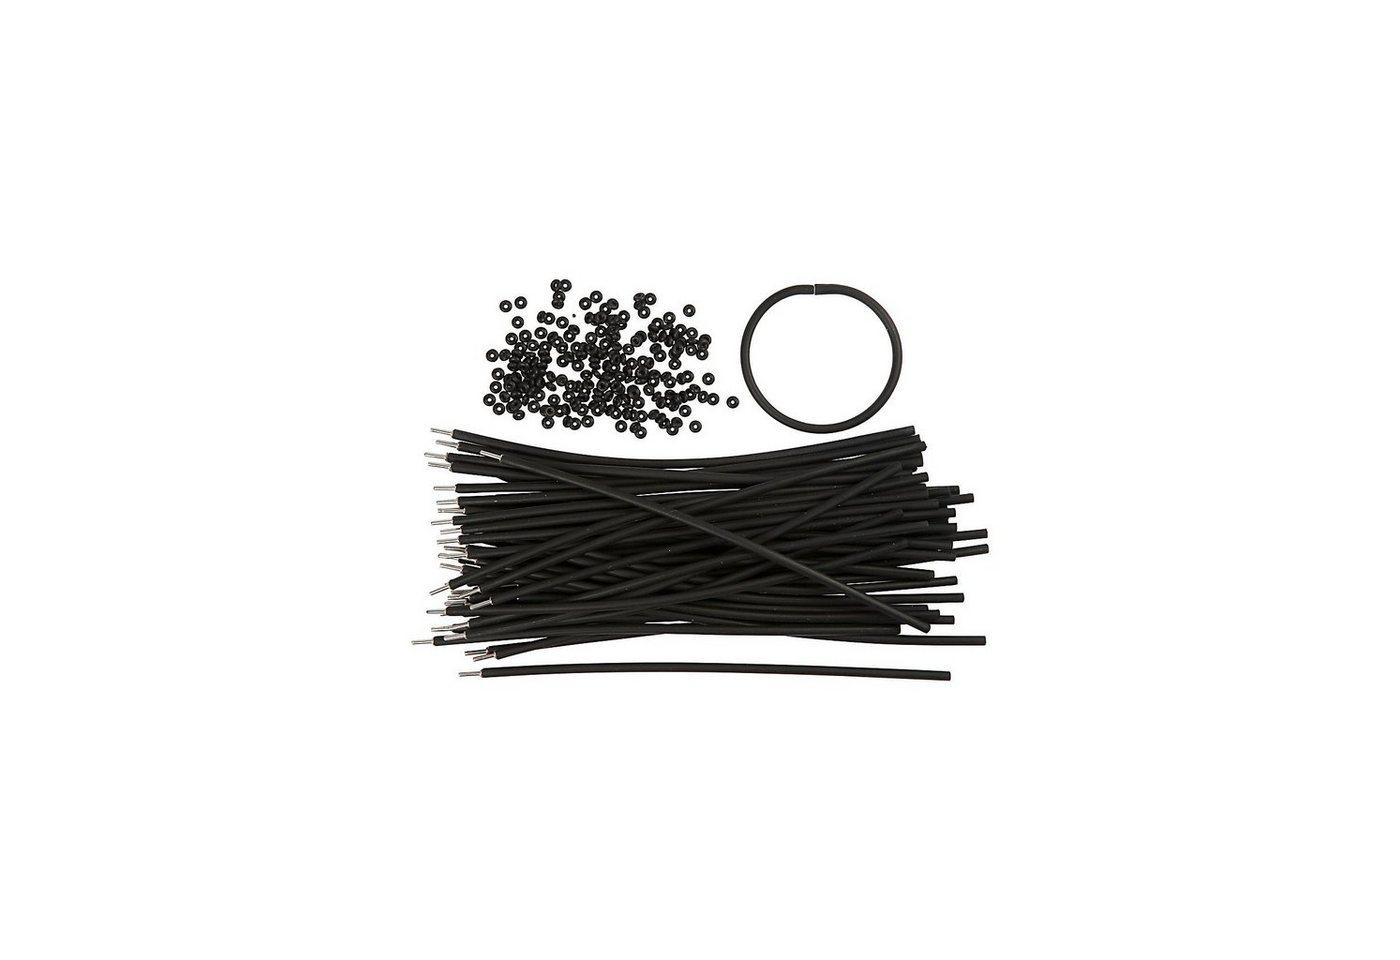 Armbänder - Sortiment, L 20 cm, Stärke: 4 mm, 48 Sets, Schwa